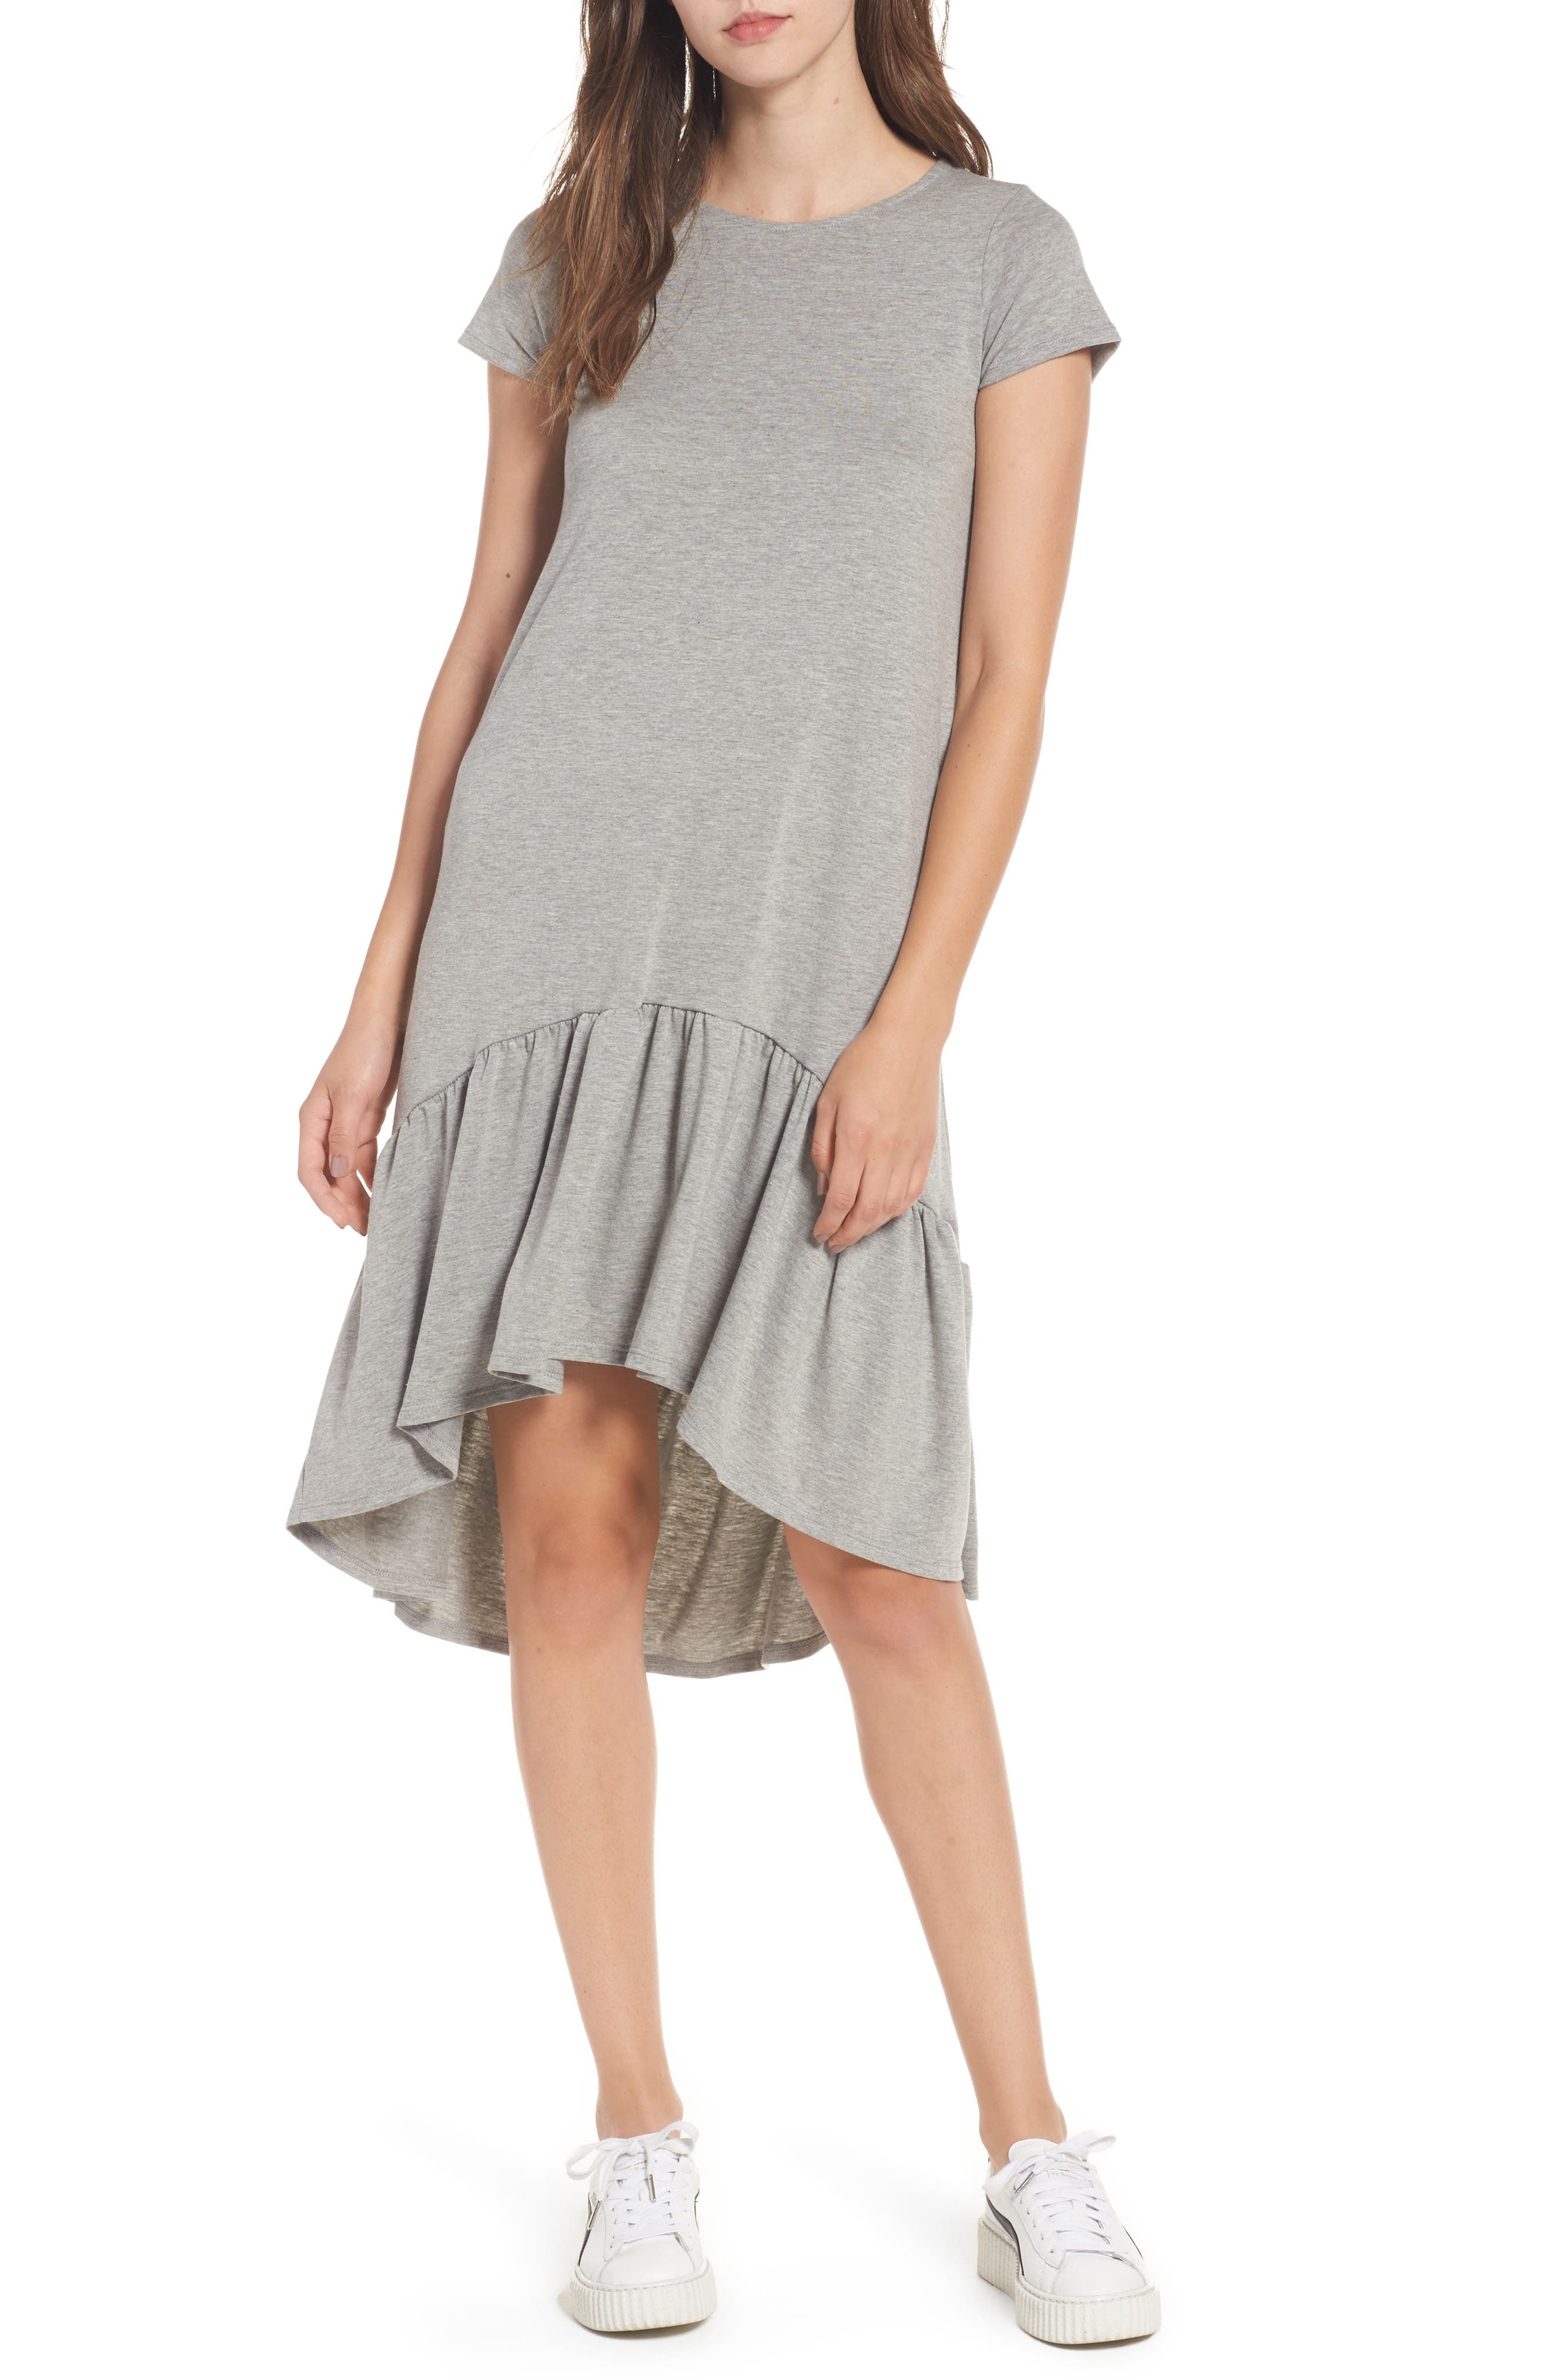 Main Image - Cotton Emporium Ruffle Hem Knit T-Shirt Dress